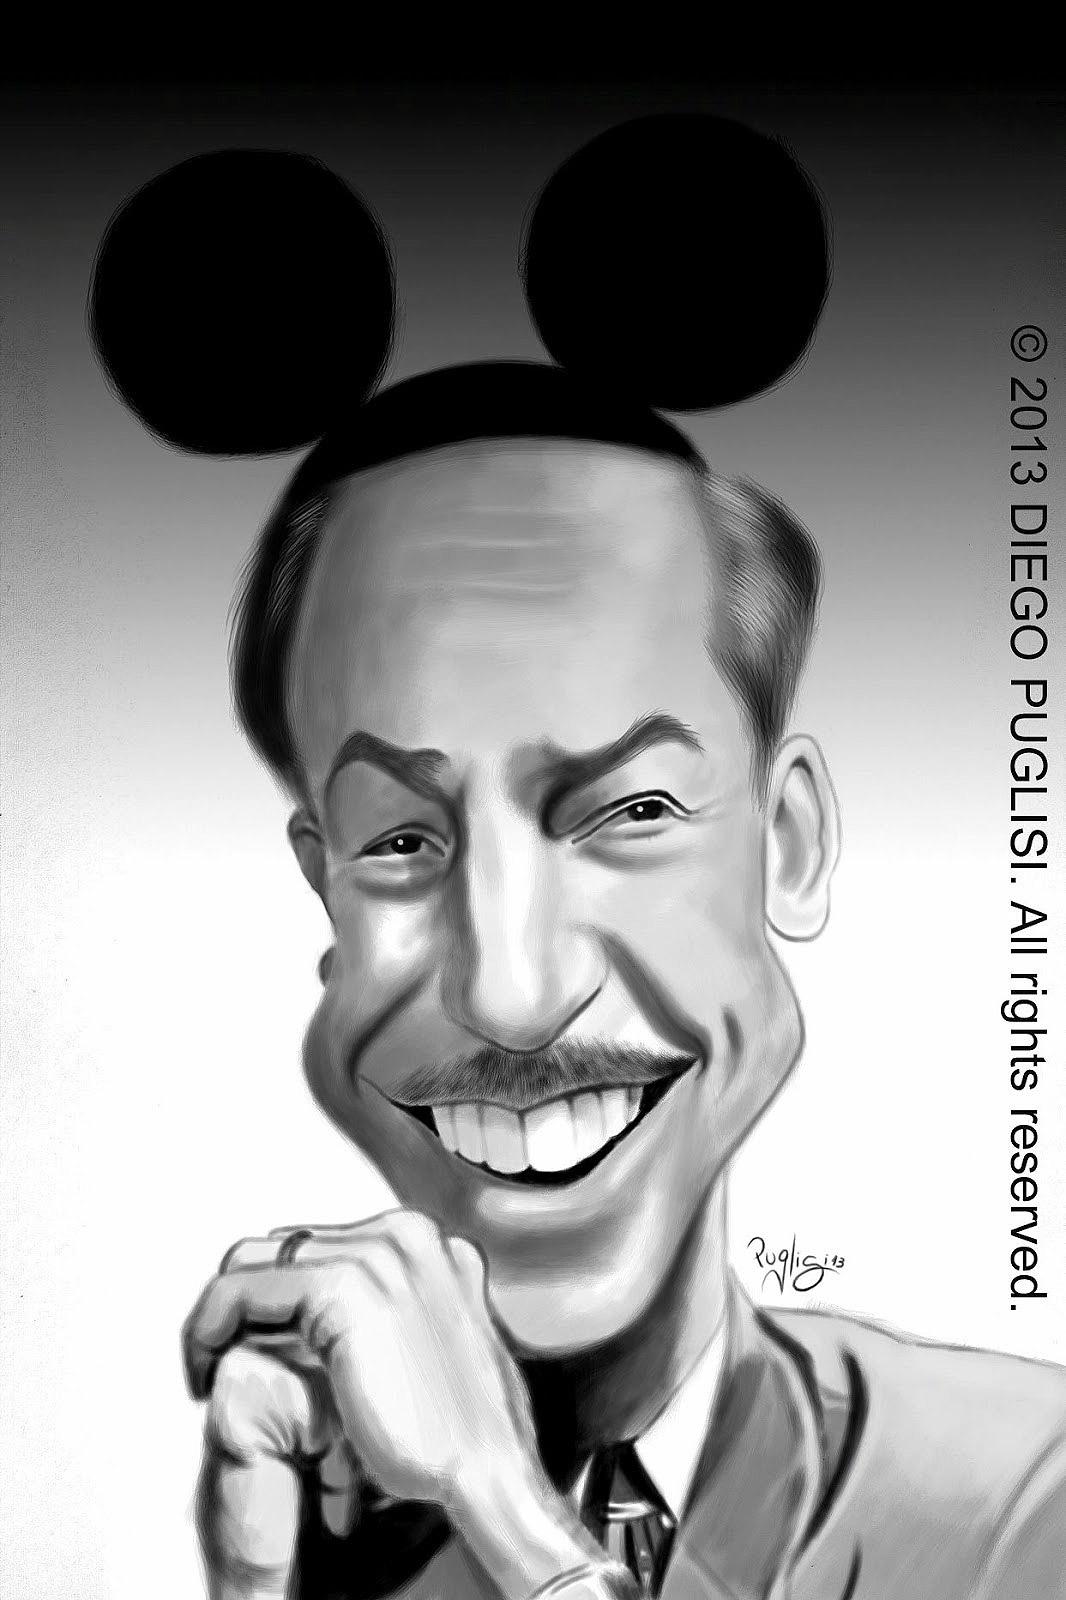 caricatura disney: